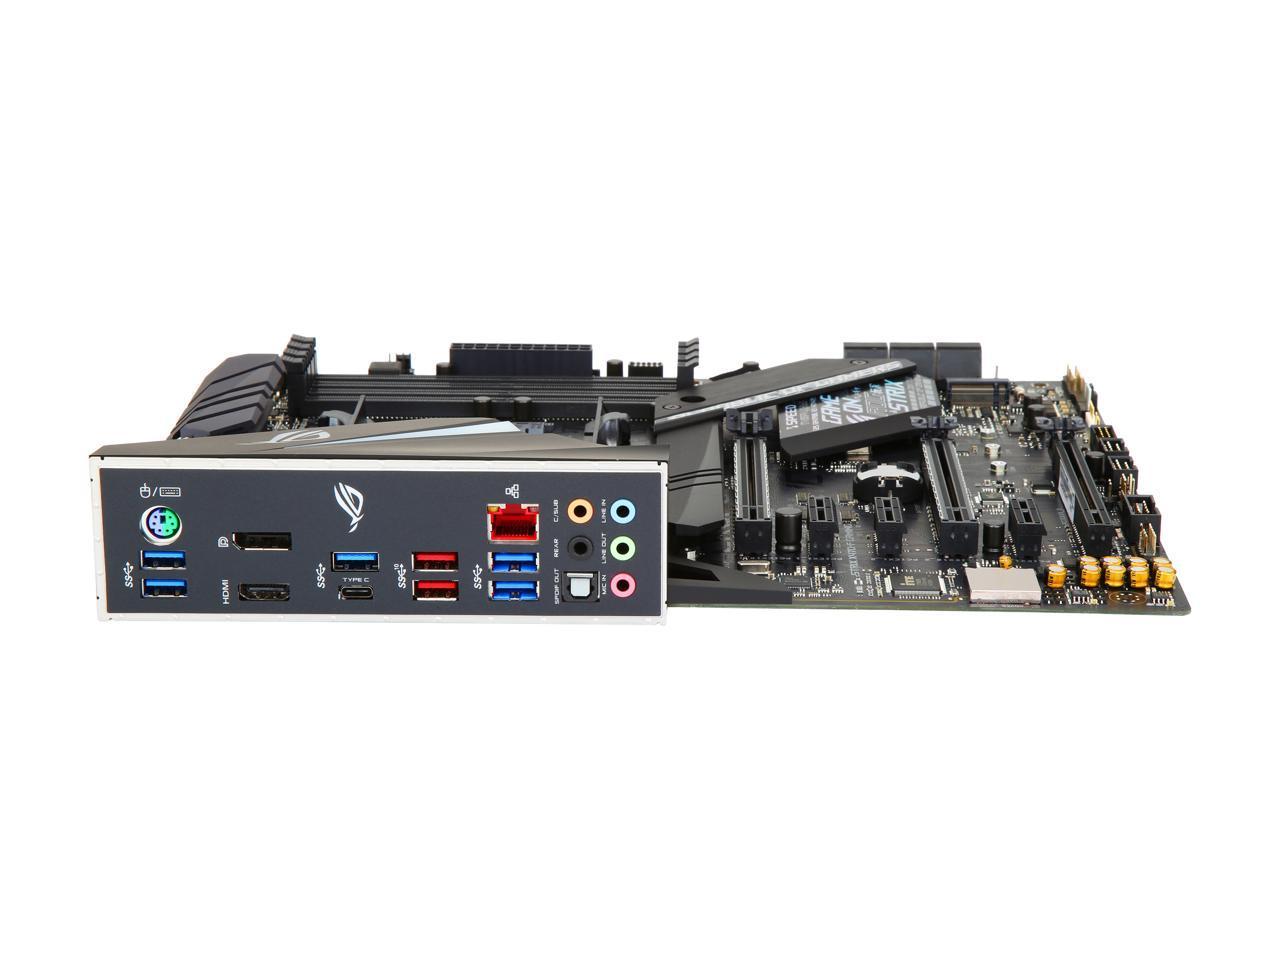 Details about ASUS ROG Strix X470-F Gaming AM4 AMD X470 SATA 6Gb/s USB 3 1  HDMI ATX AMD Mother